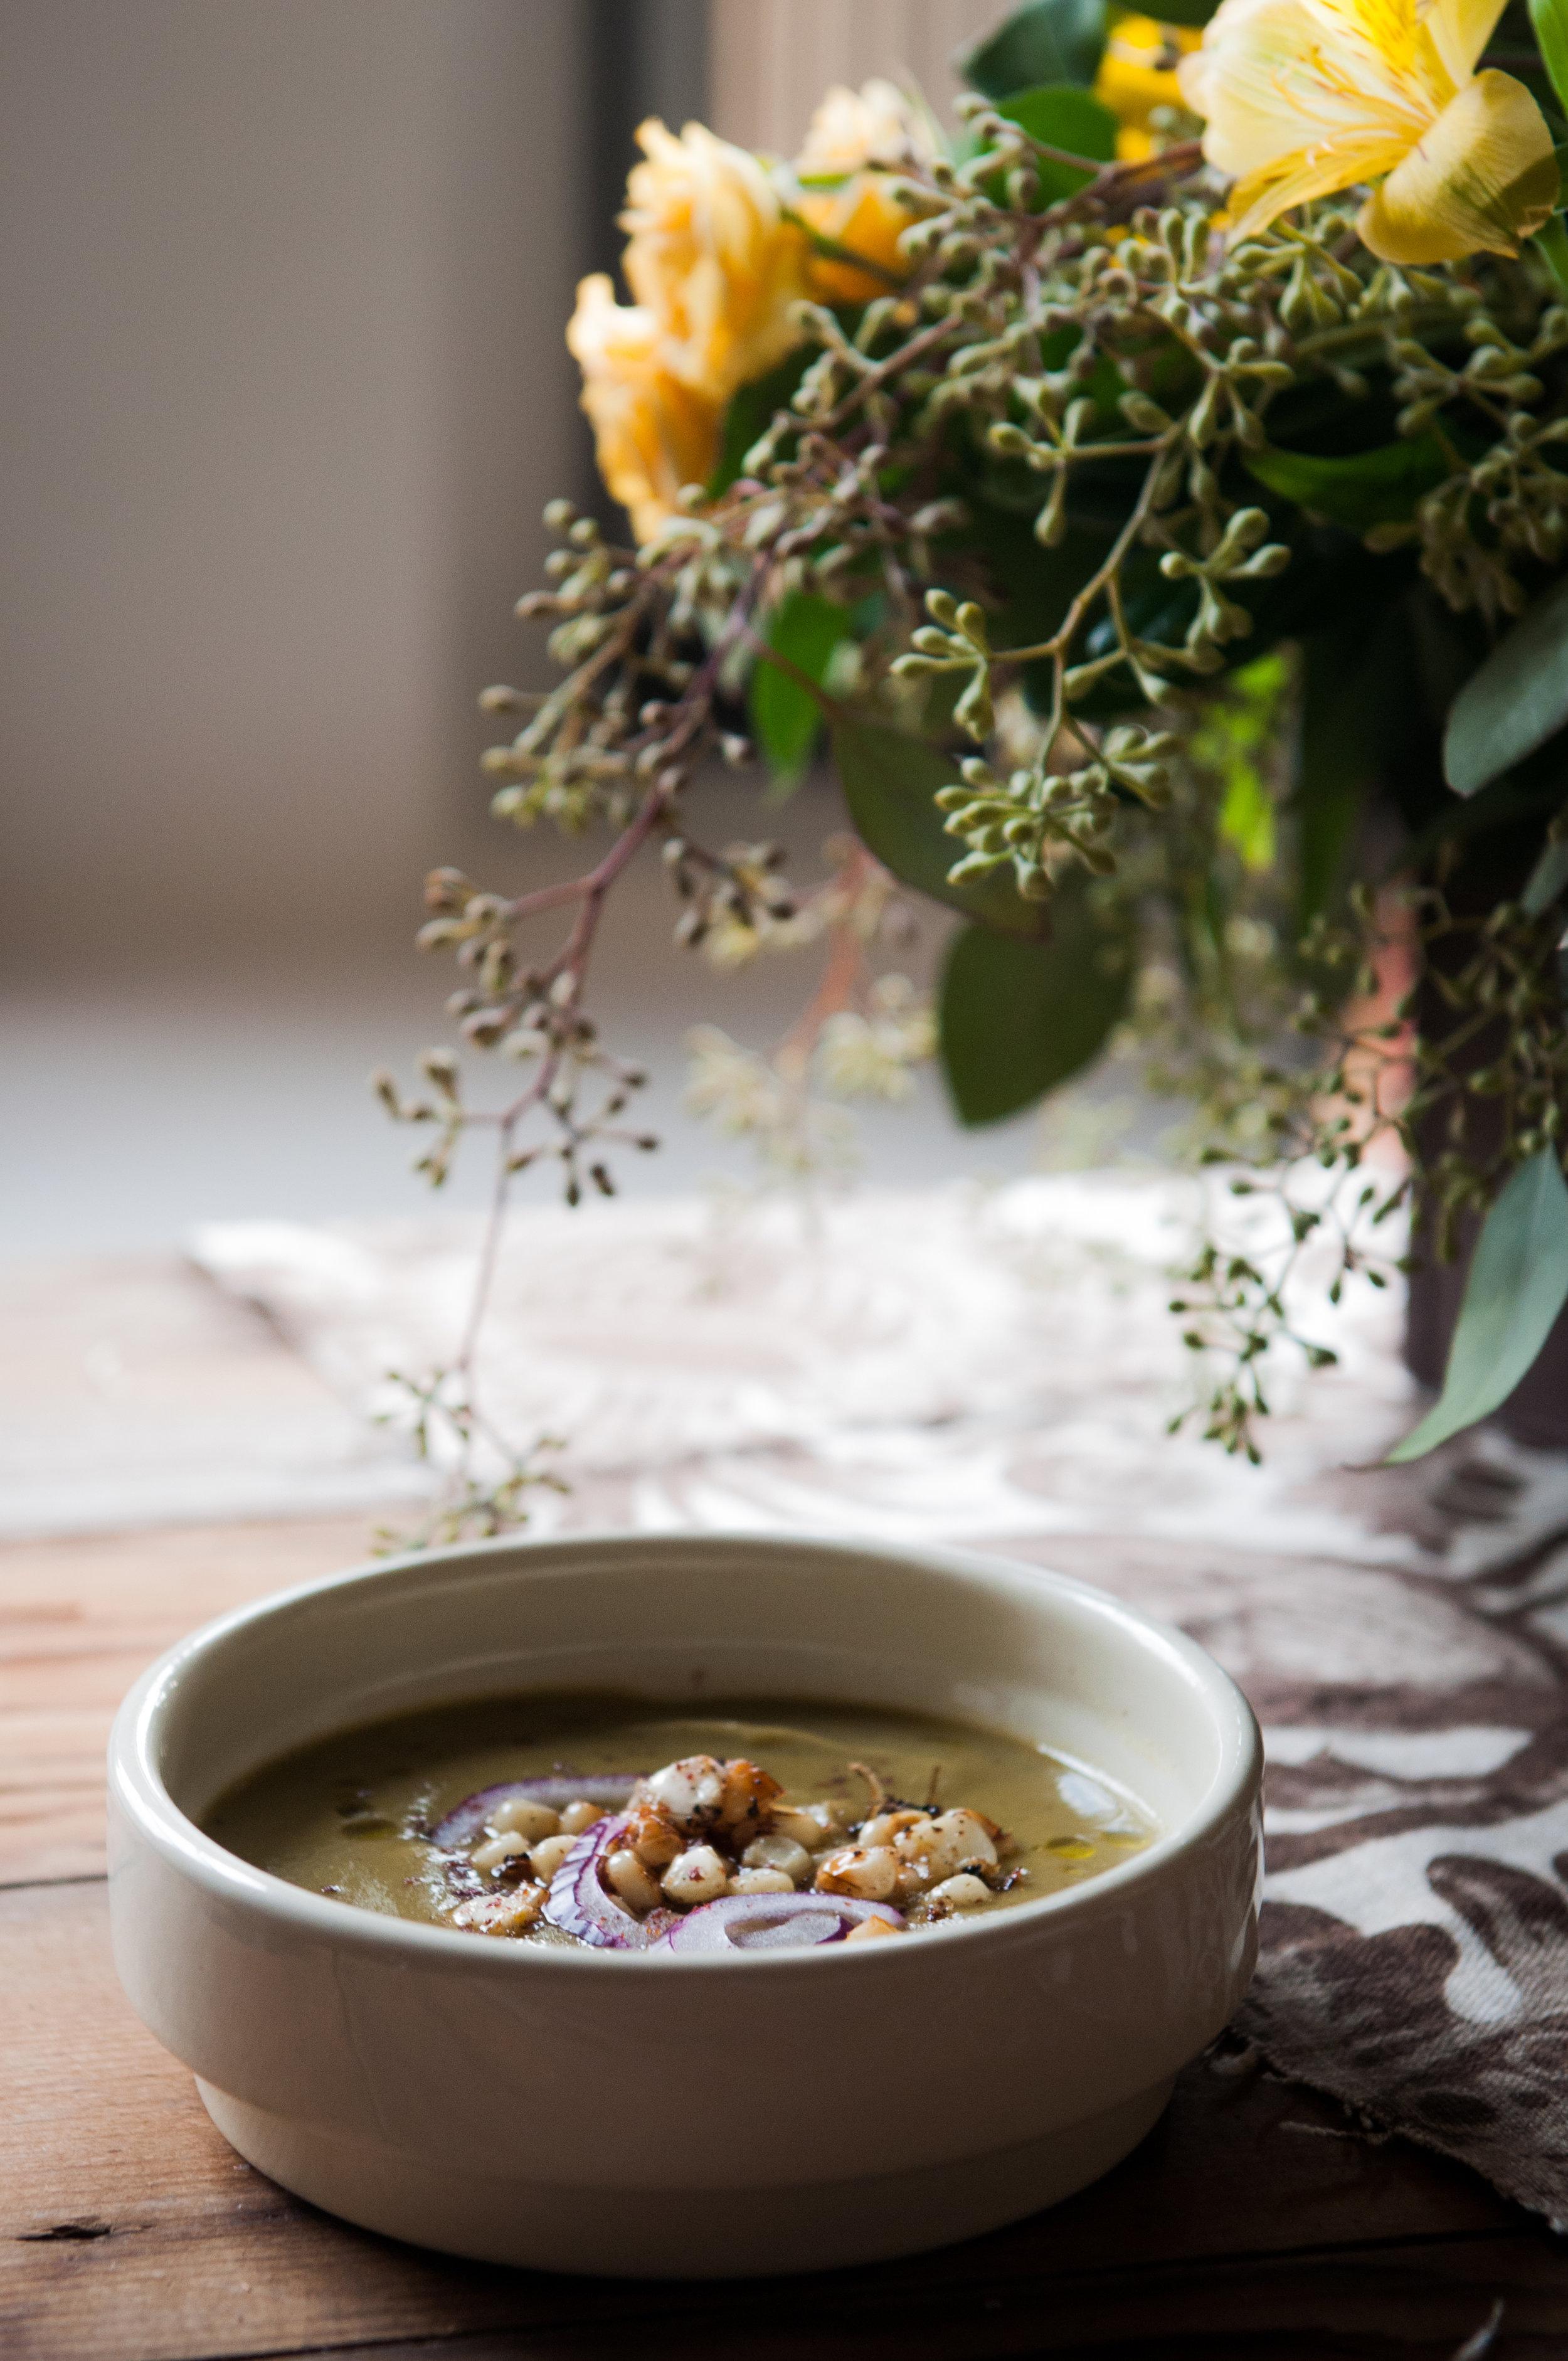 CELERIAC + PARSLEY ROOT SOUP